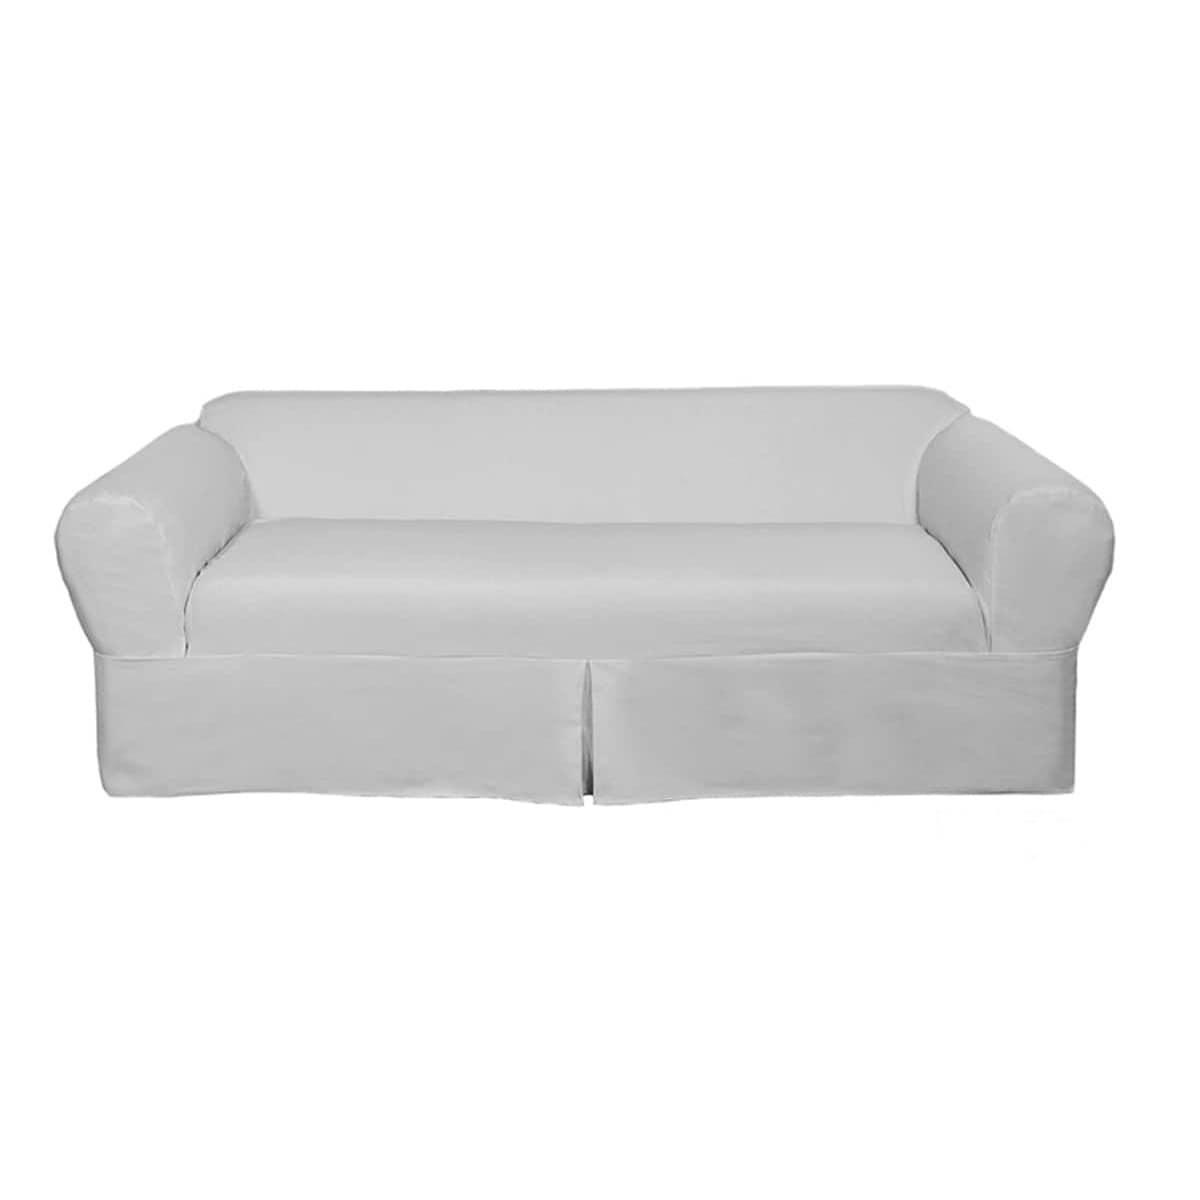 Merveilleux Shop Classic 2 Piece Twill Sofa Slipcover   Free Shipping Today    Overstock.com   7358756